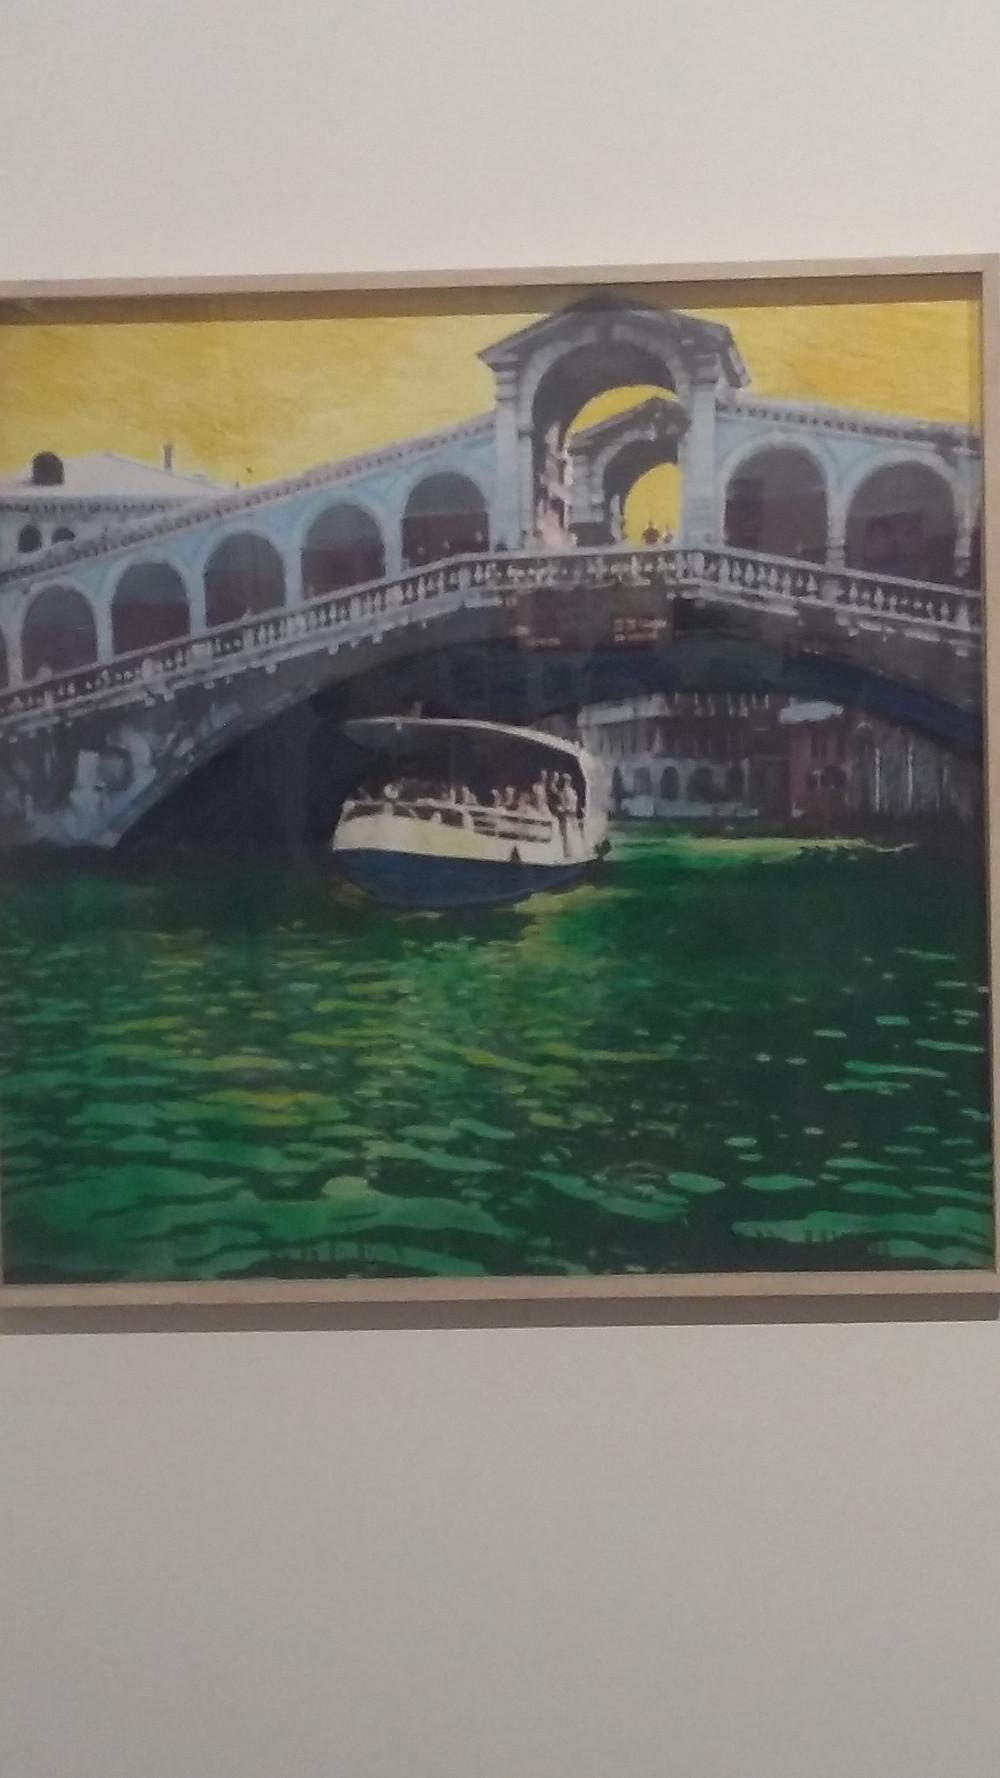 #uriburu #rialto #canalgrande #1968